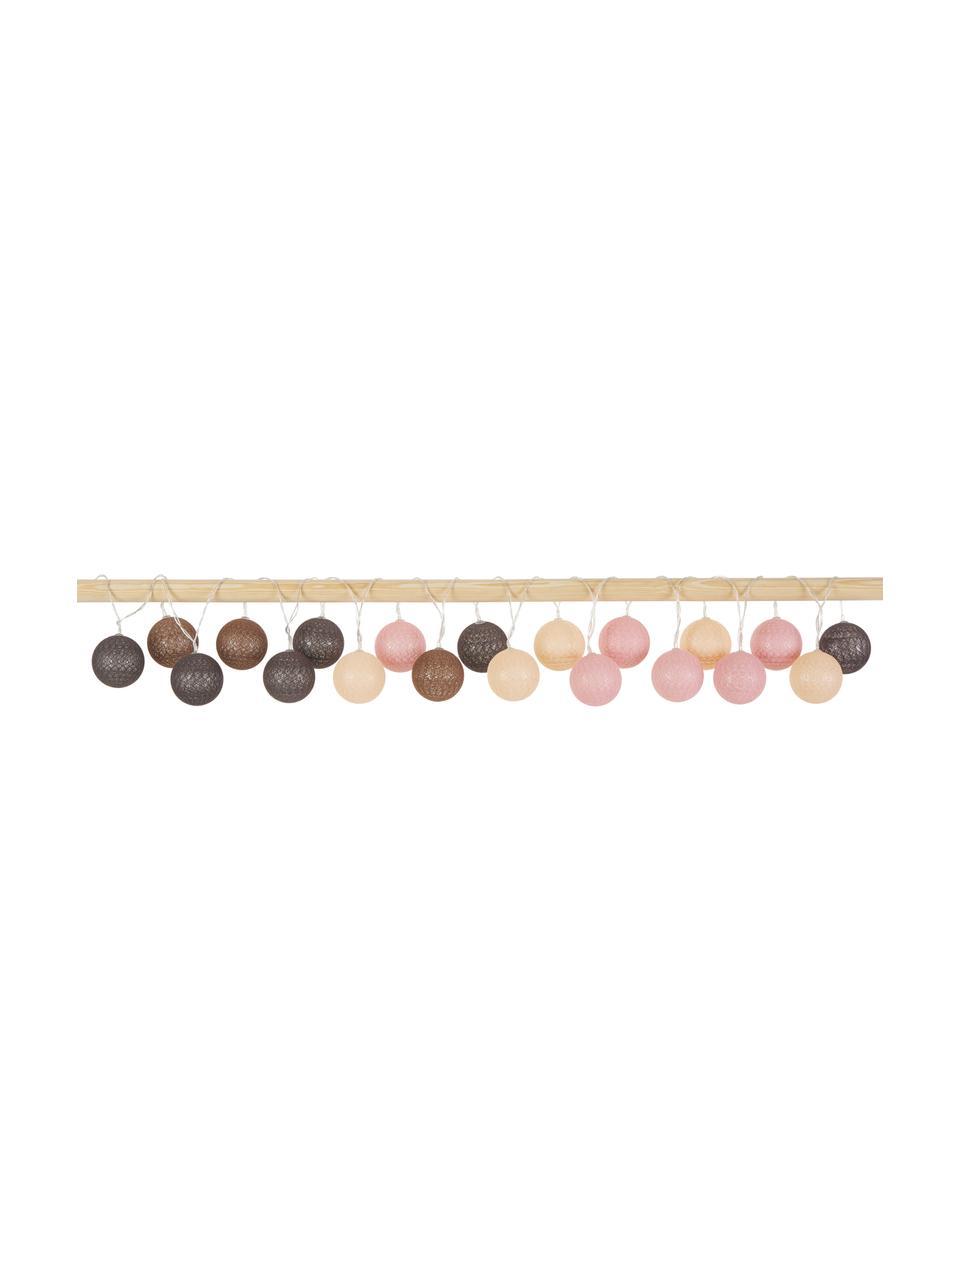 LED-Lichterkette Bellin, 320 cm, 20 Lampions, Lampions: Baumwolle, Braun, Beige, Schwarz, Rosa, L 320 cm